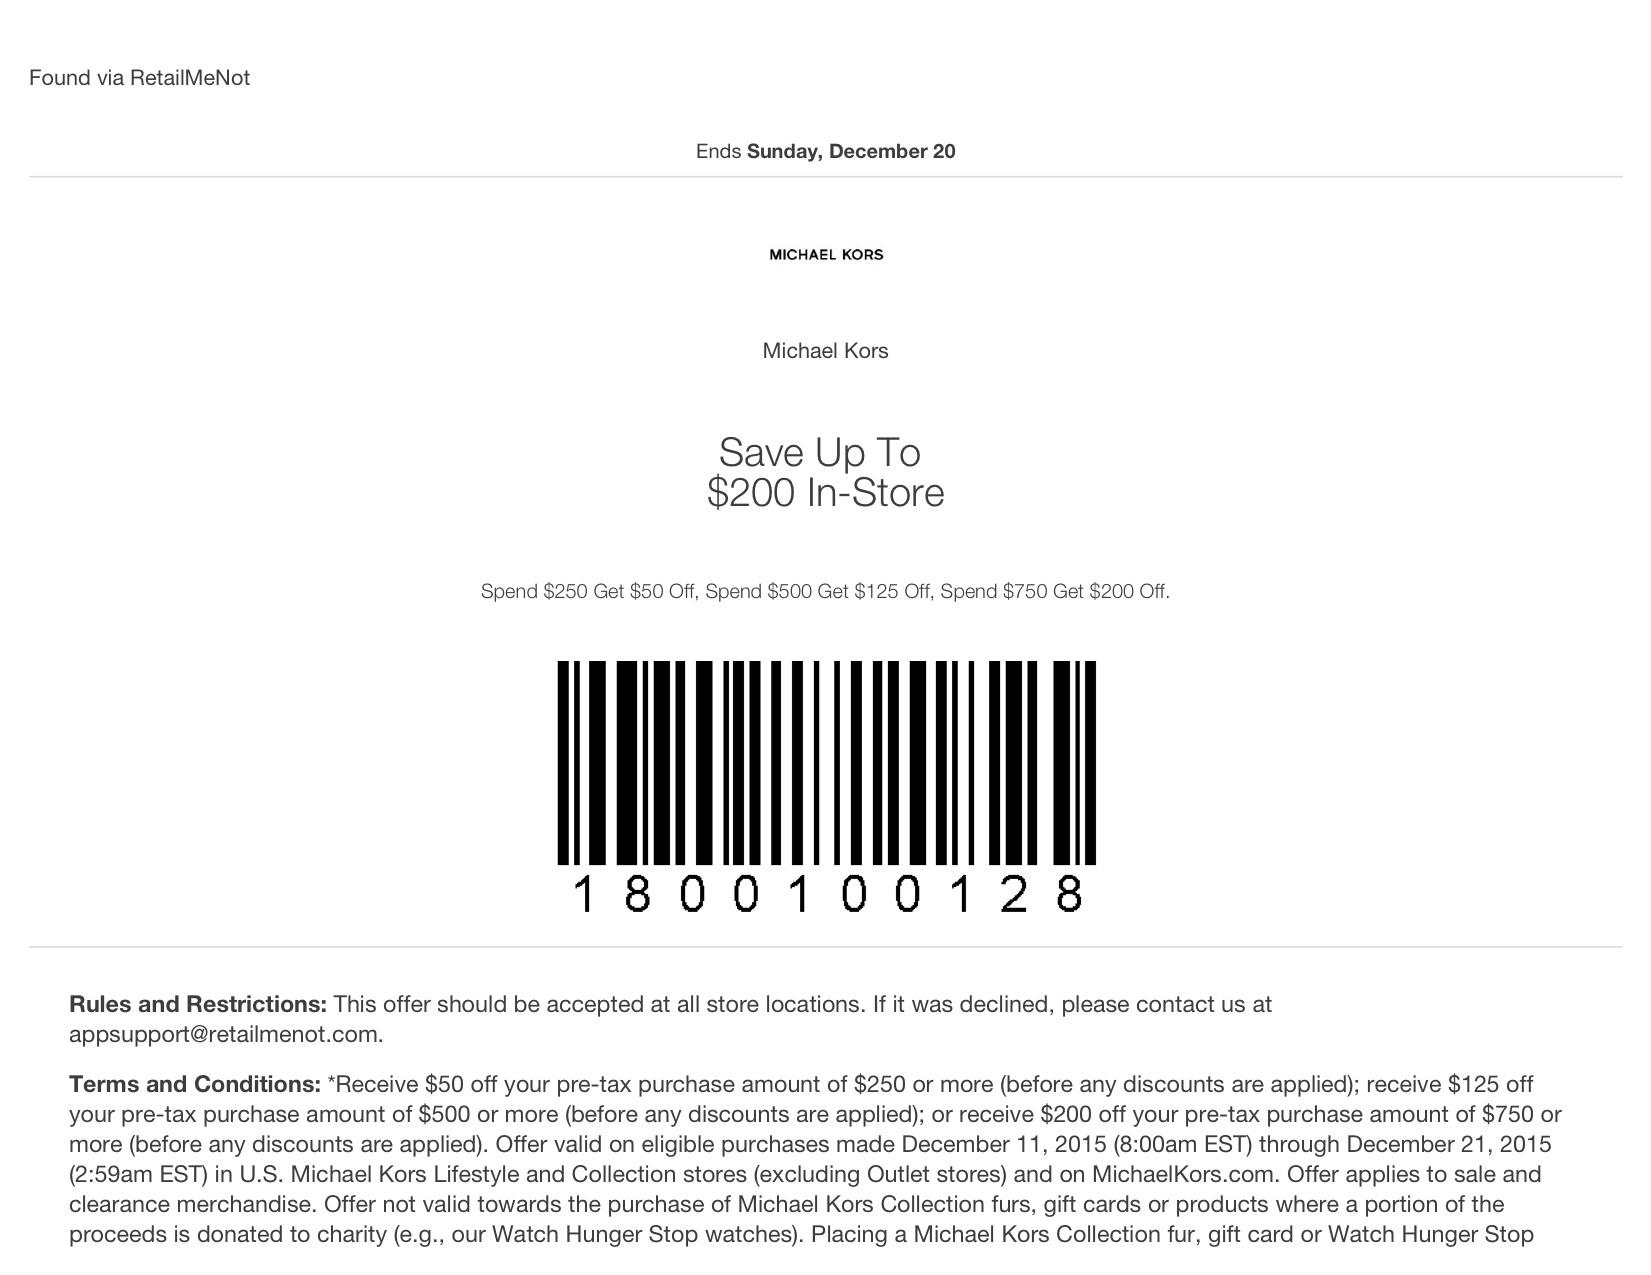 Michael Kors Coupons In Store & Online (Printable Coupons) - Free Printable Michaels Coupons